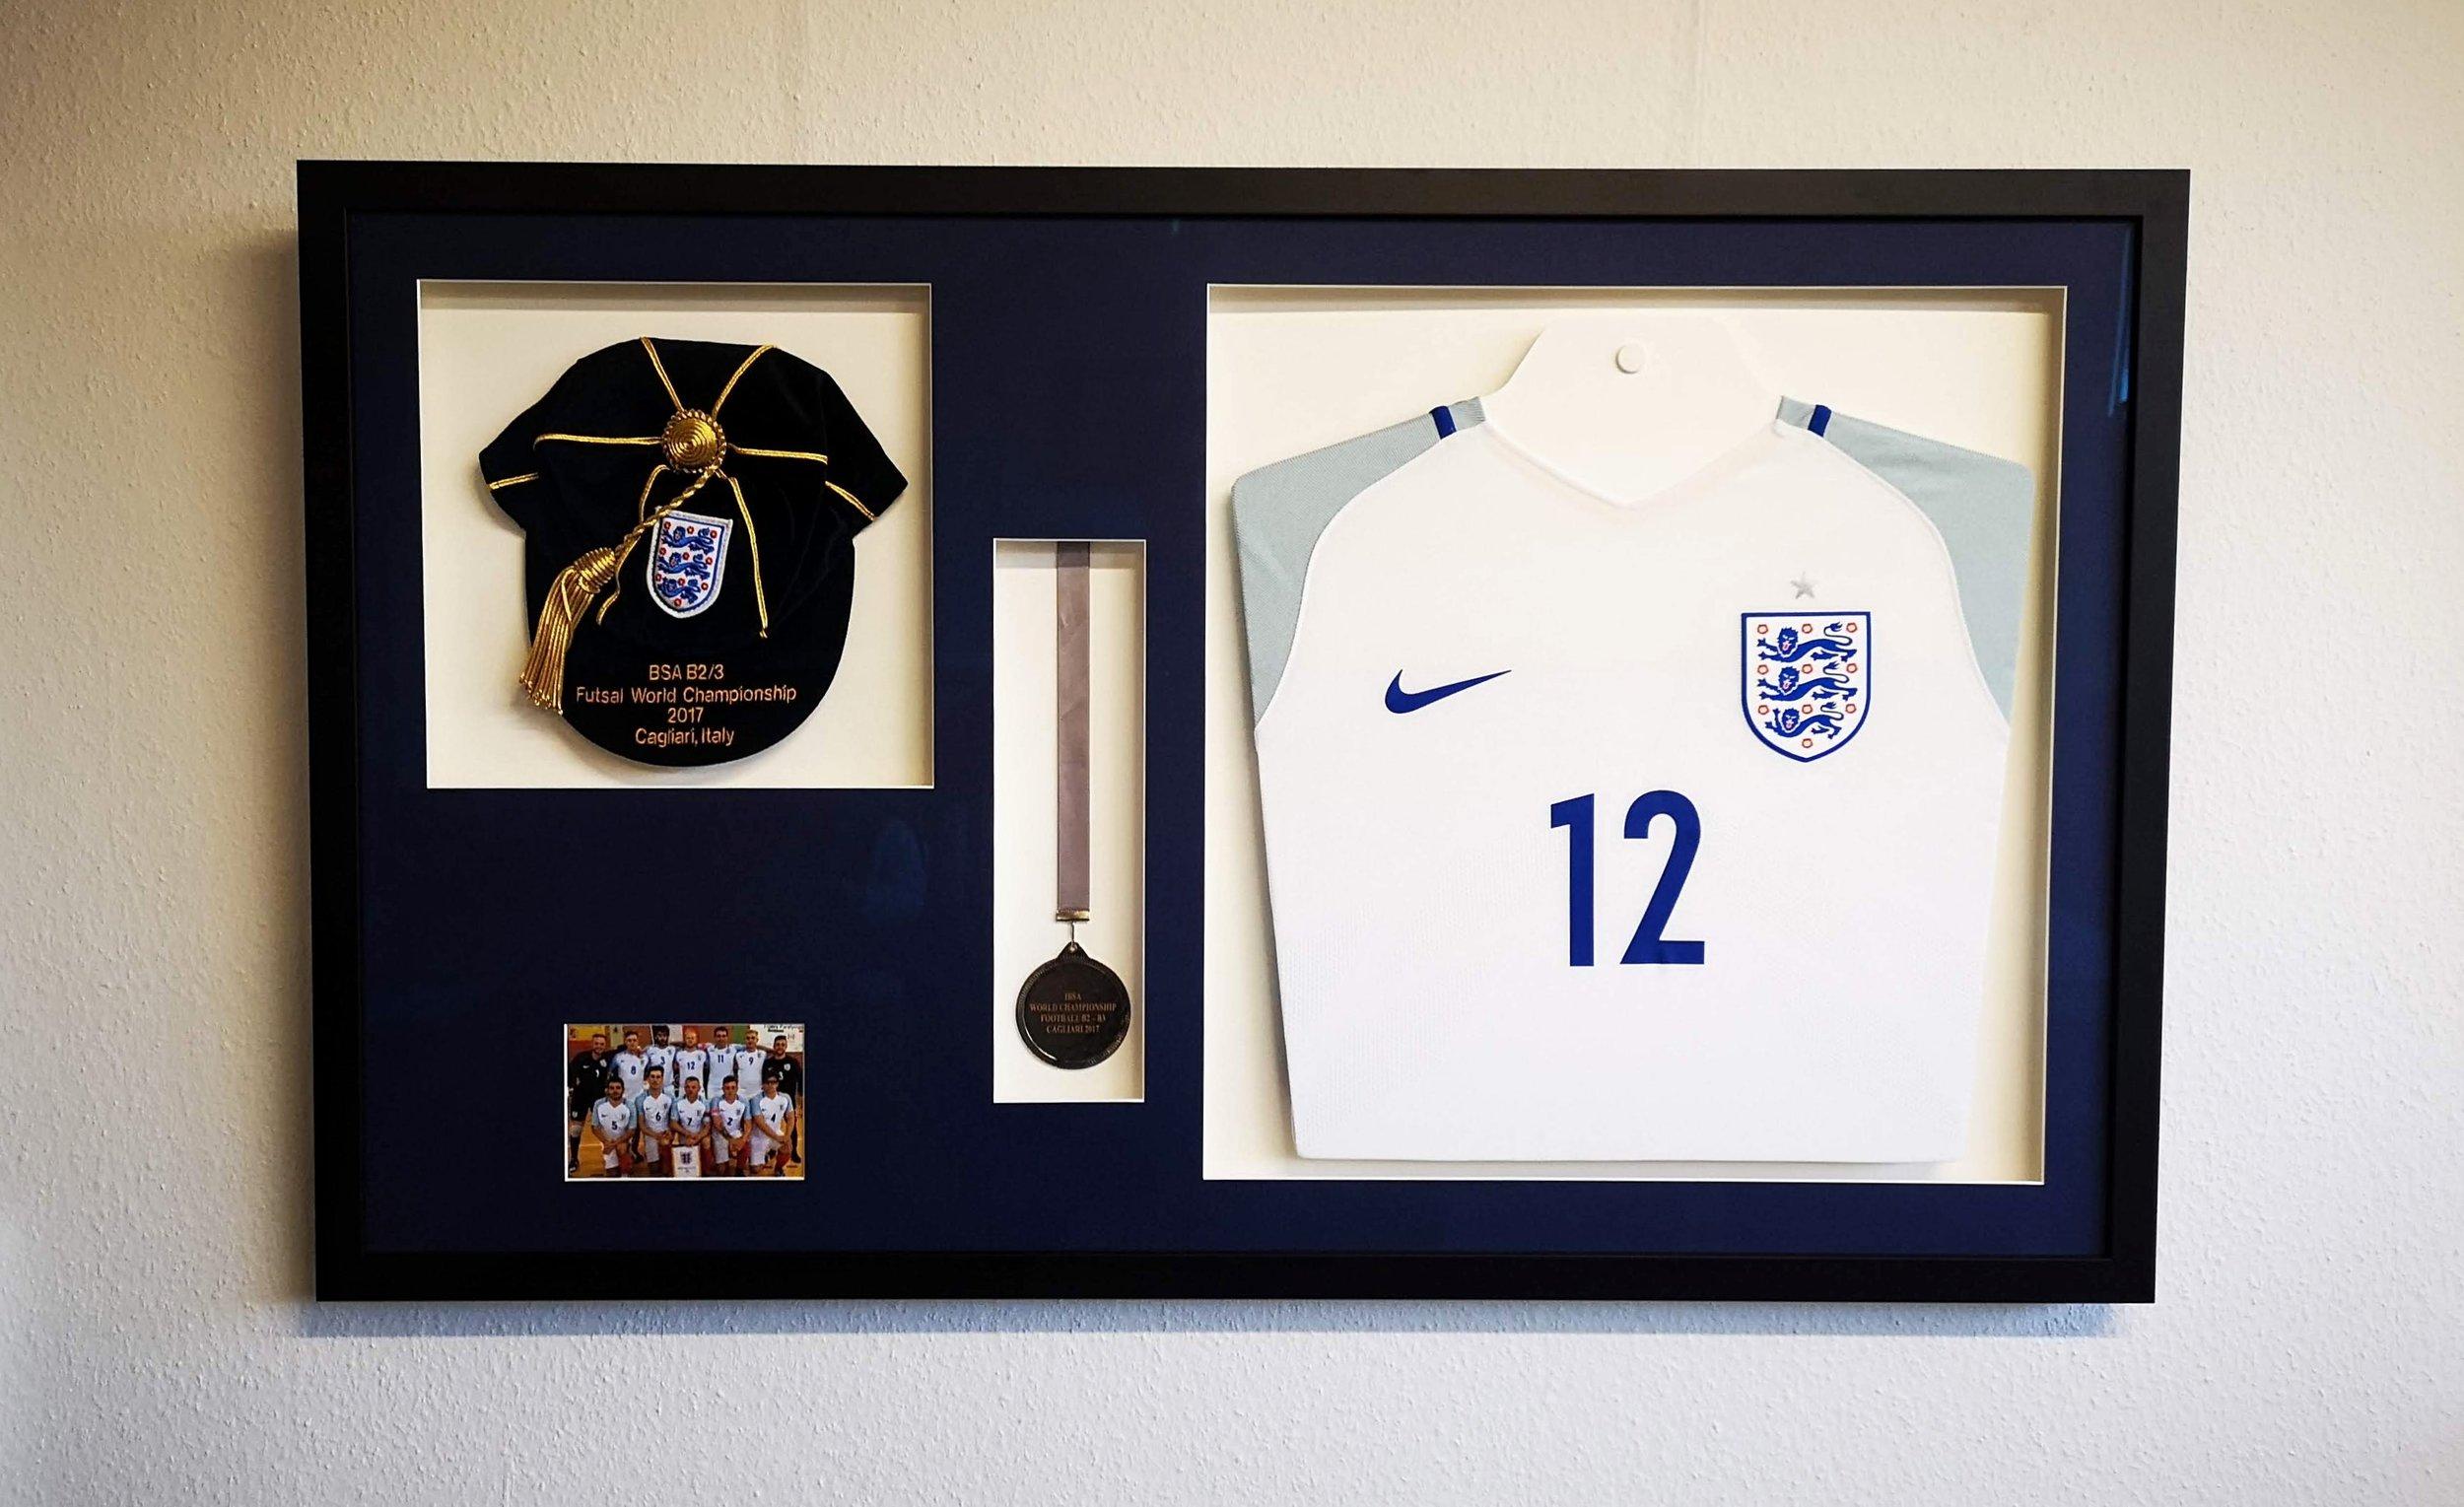 england football cap medal and shirt framed